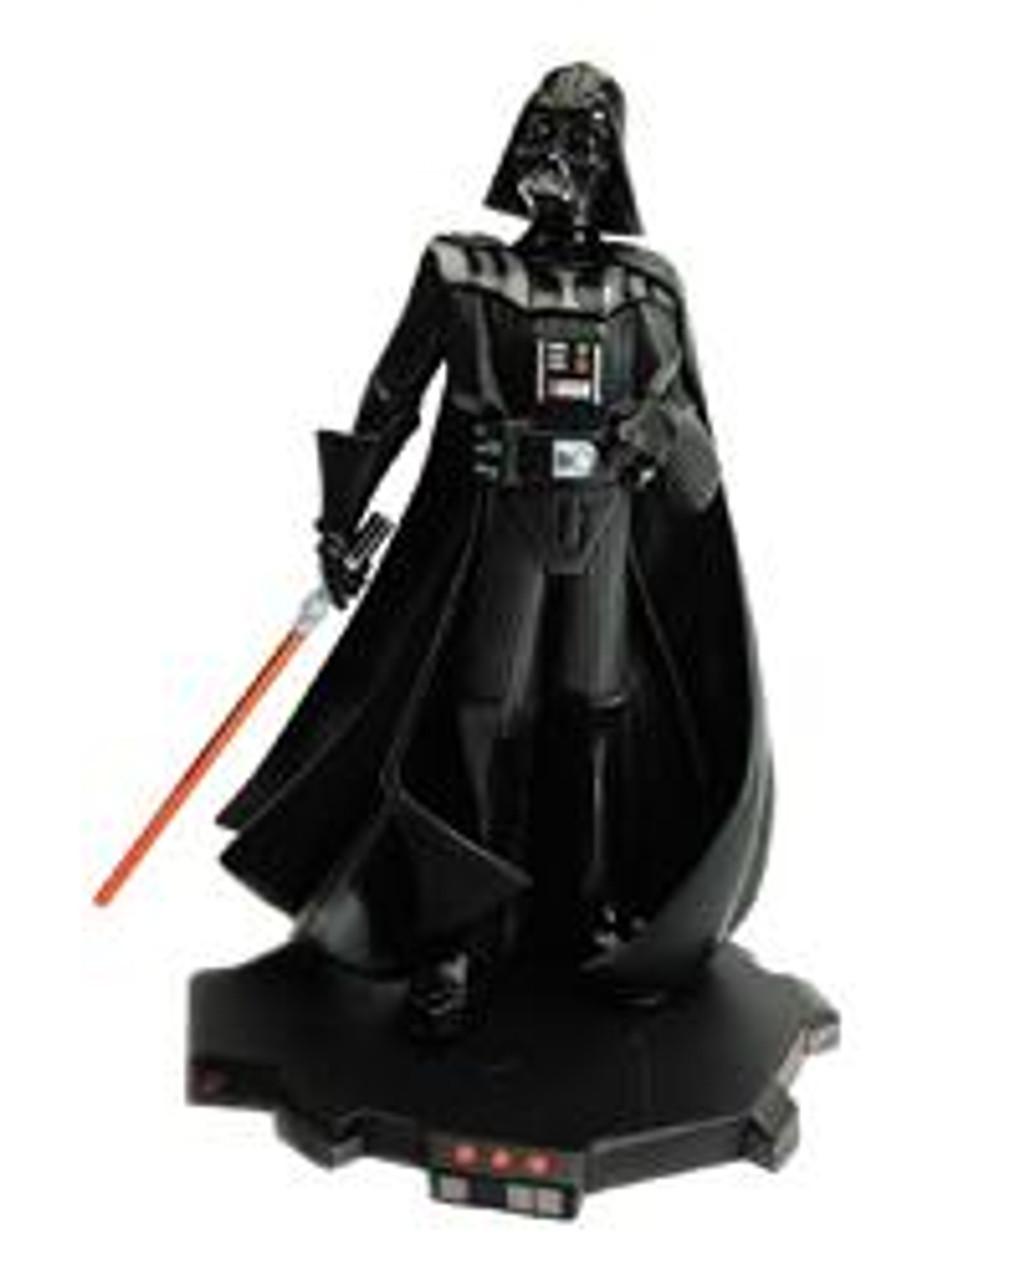 Star Wars Animated Darth Vader 9.5-Inch Maquette Statue